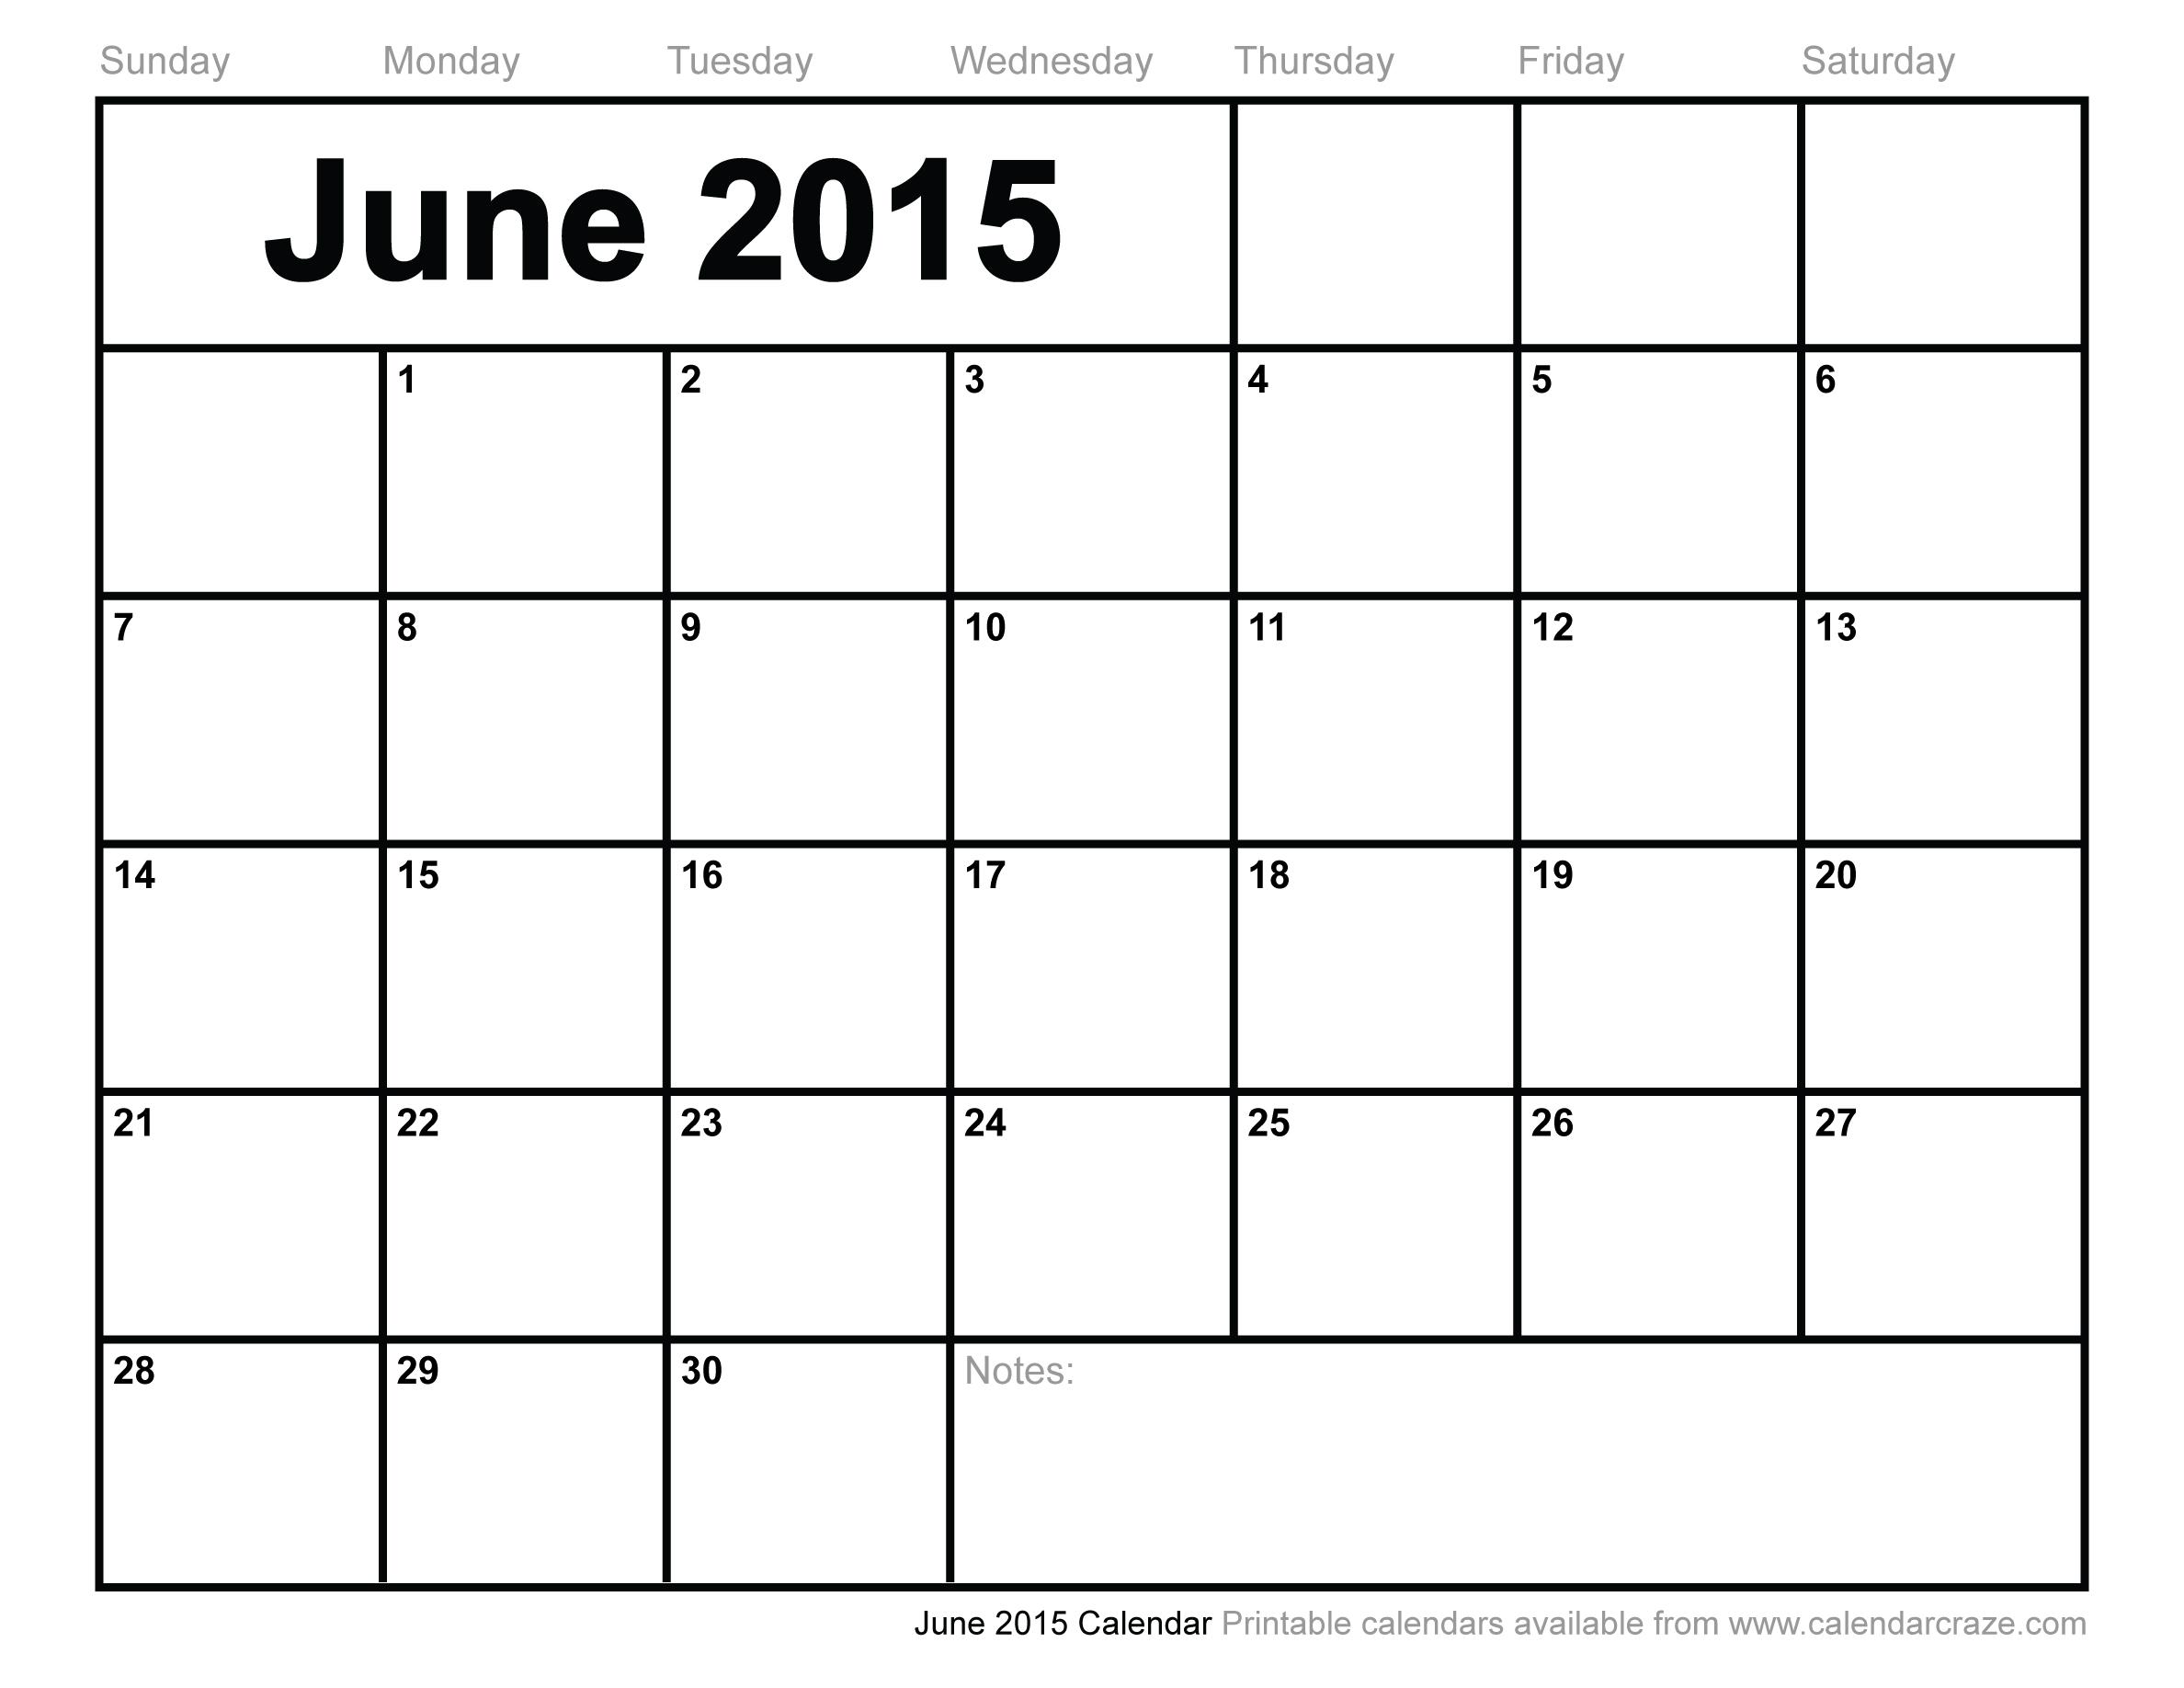 March 2015 Calendar Printable June